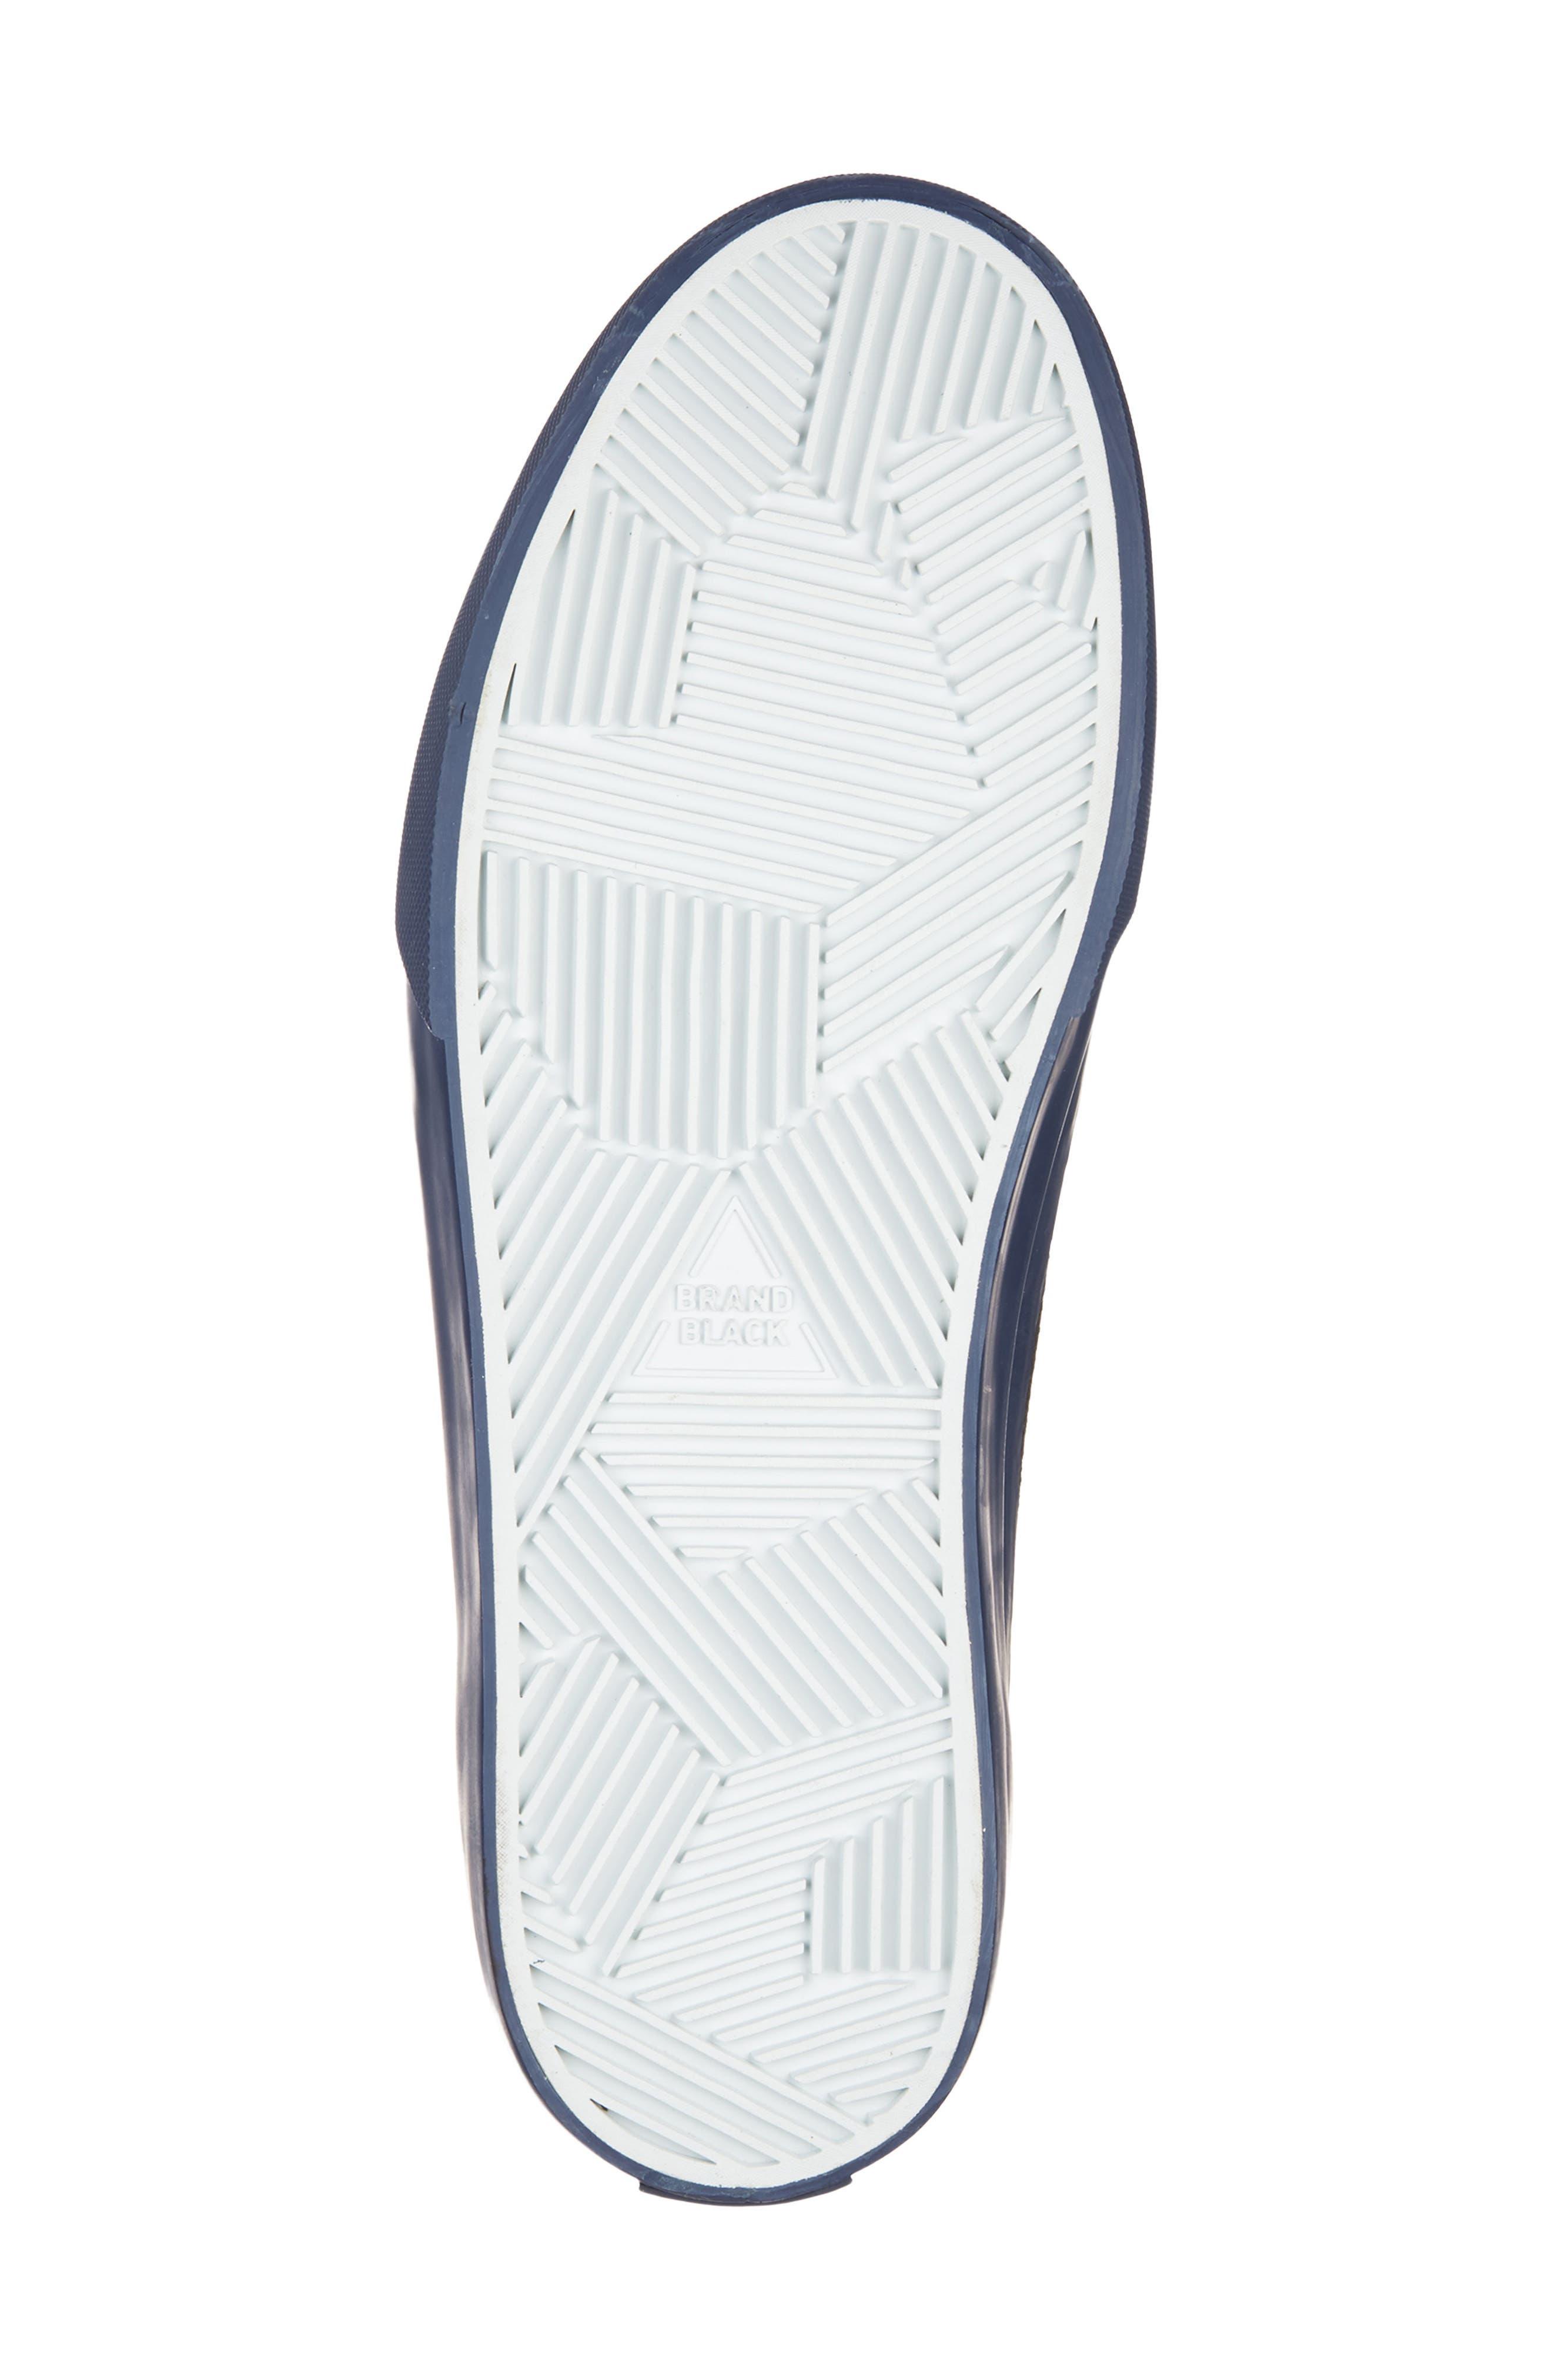 Vesta Low Top Sneaker,                             Alternate thumbnail 6, color,                             BLACK/ NAVY